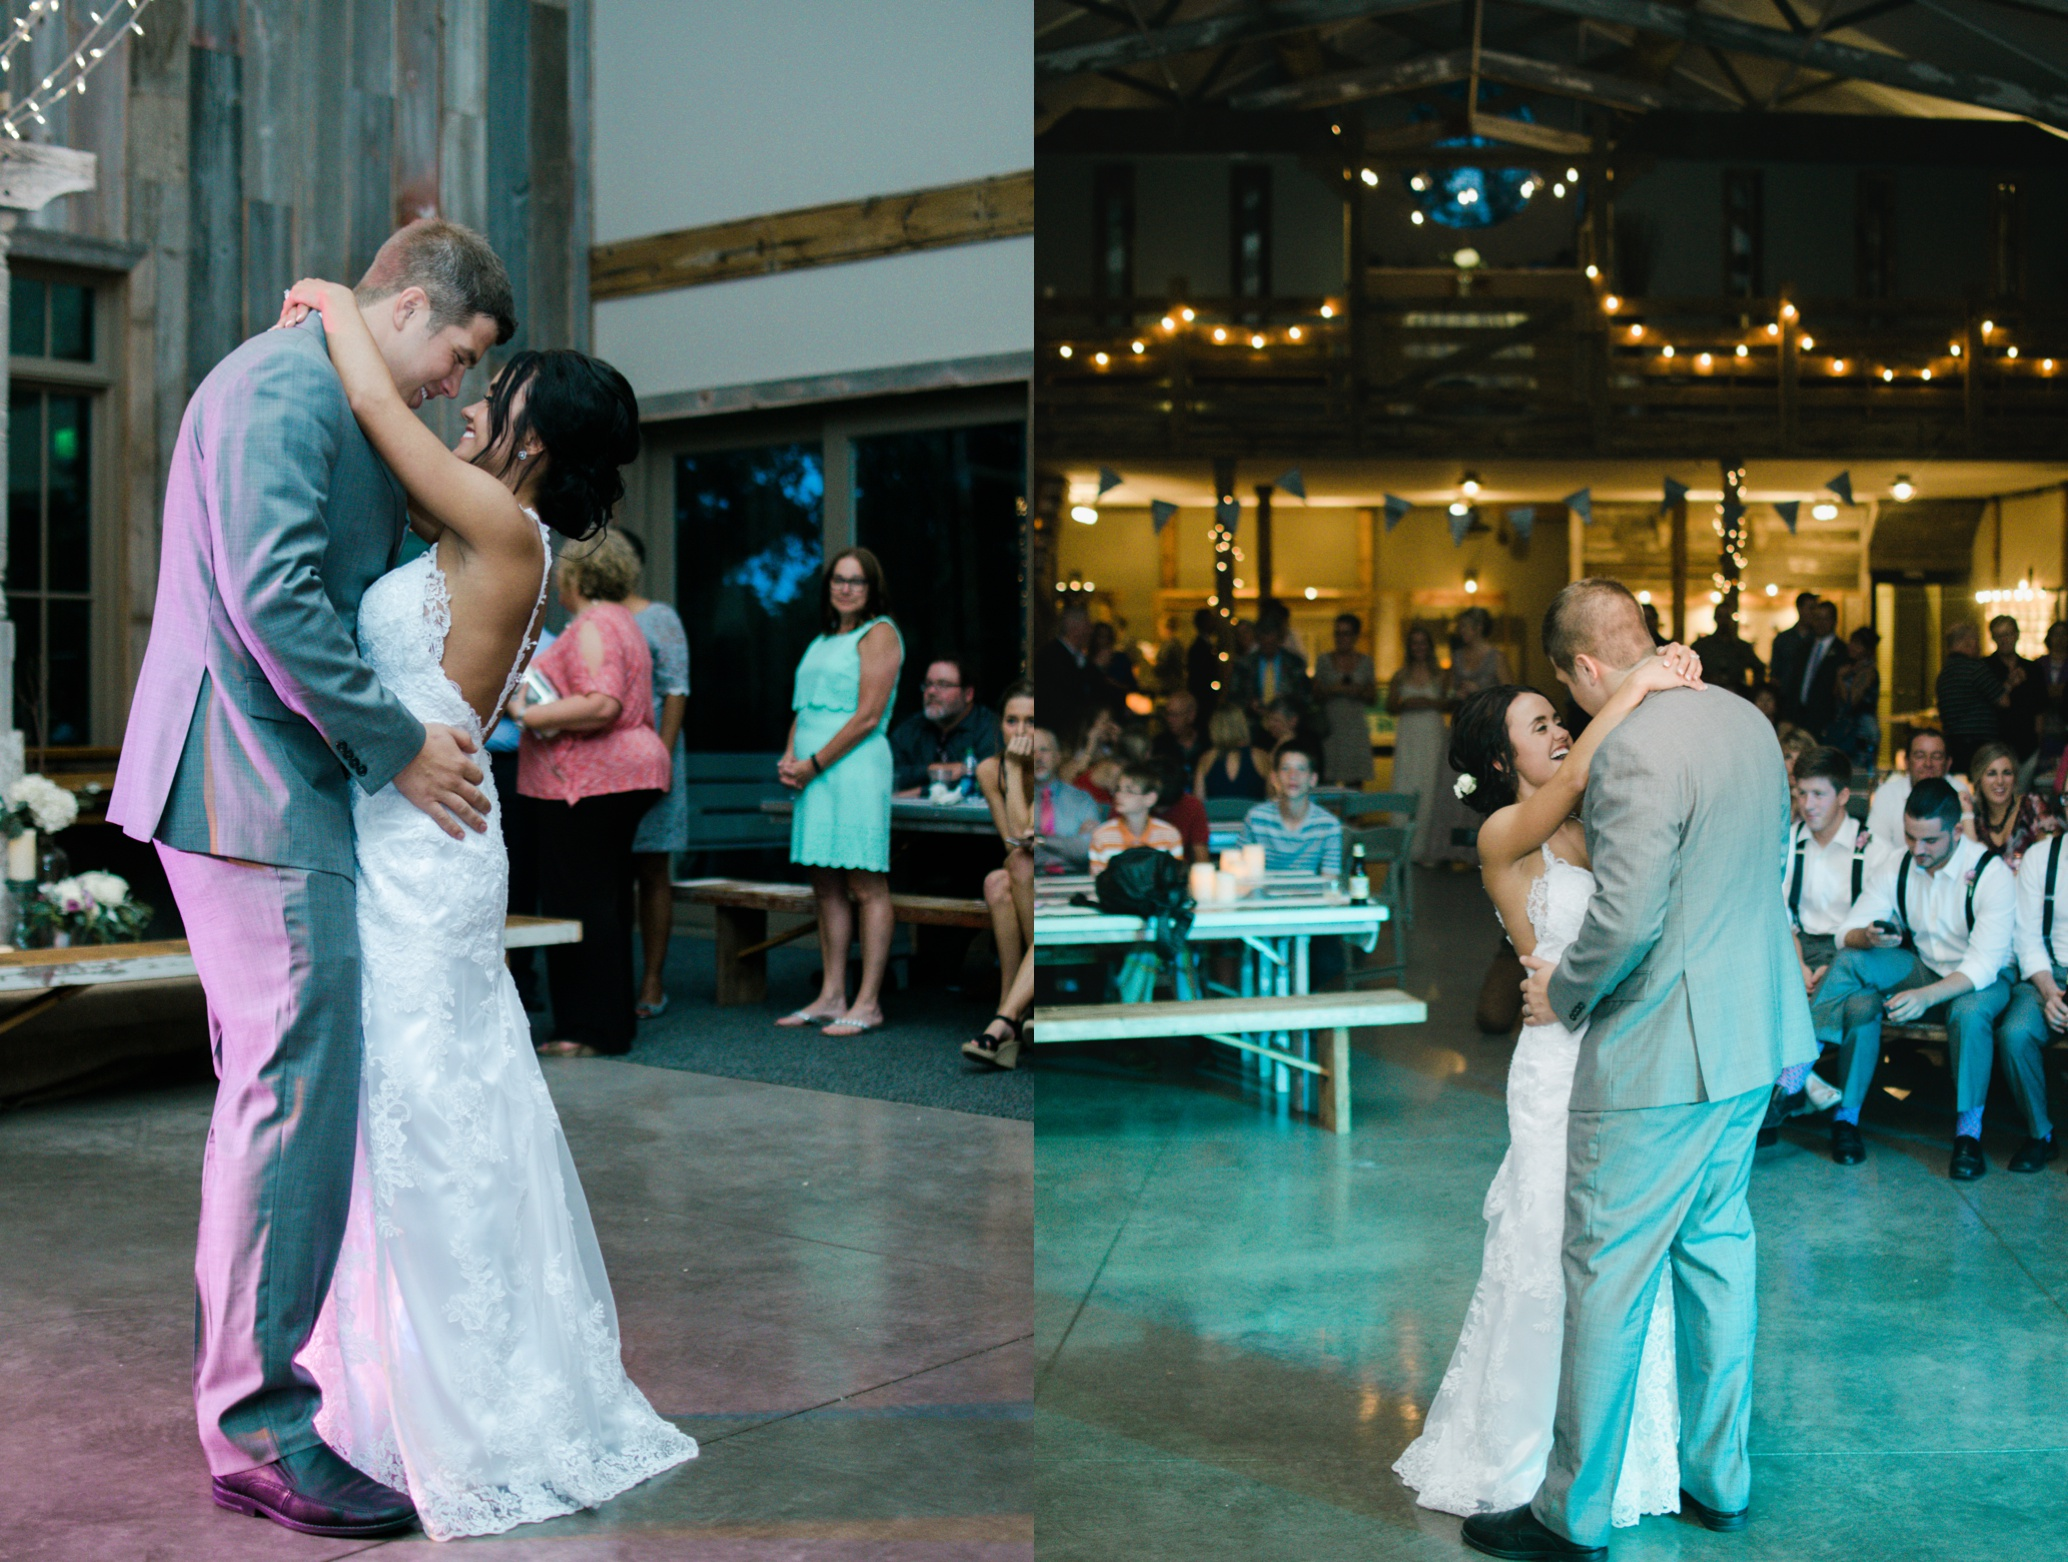 Barnes' Place Rustic Outdoor Wedding | Ali Leigh Photo Minneapolis Wedding Photographer_0172.jpg